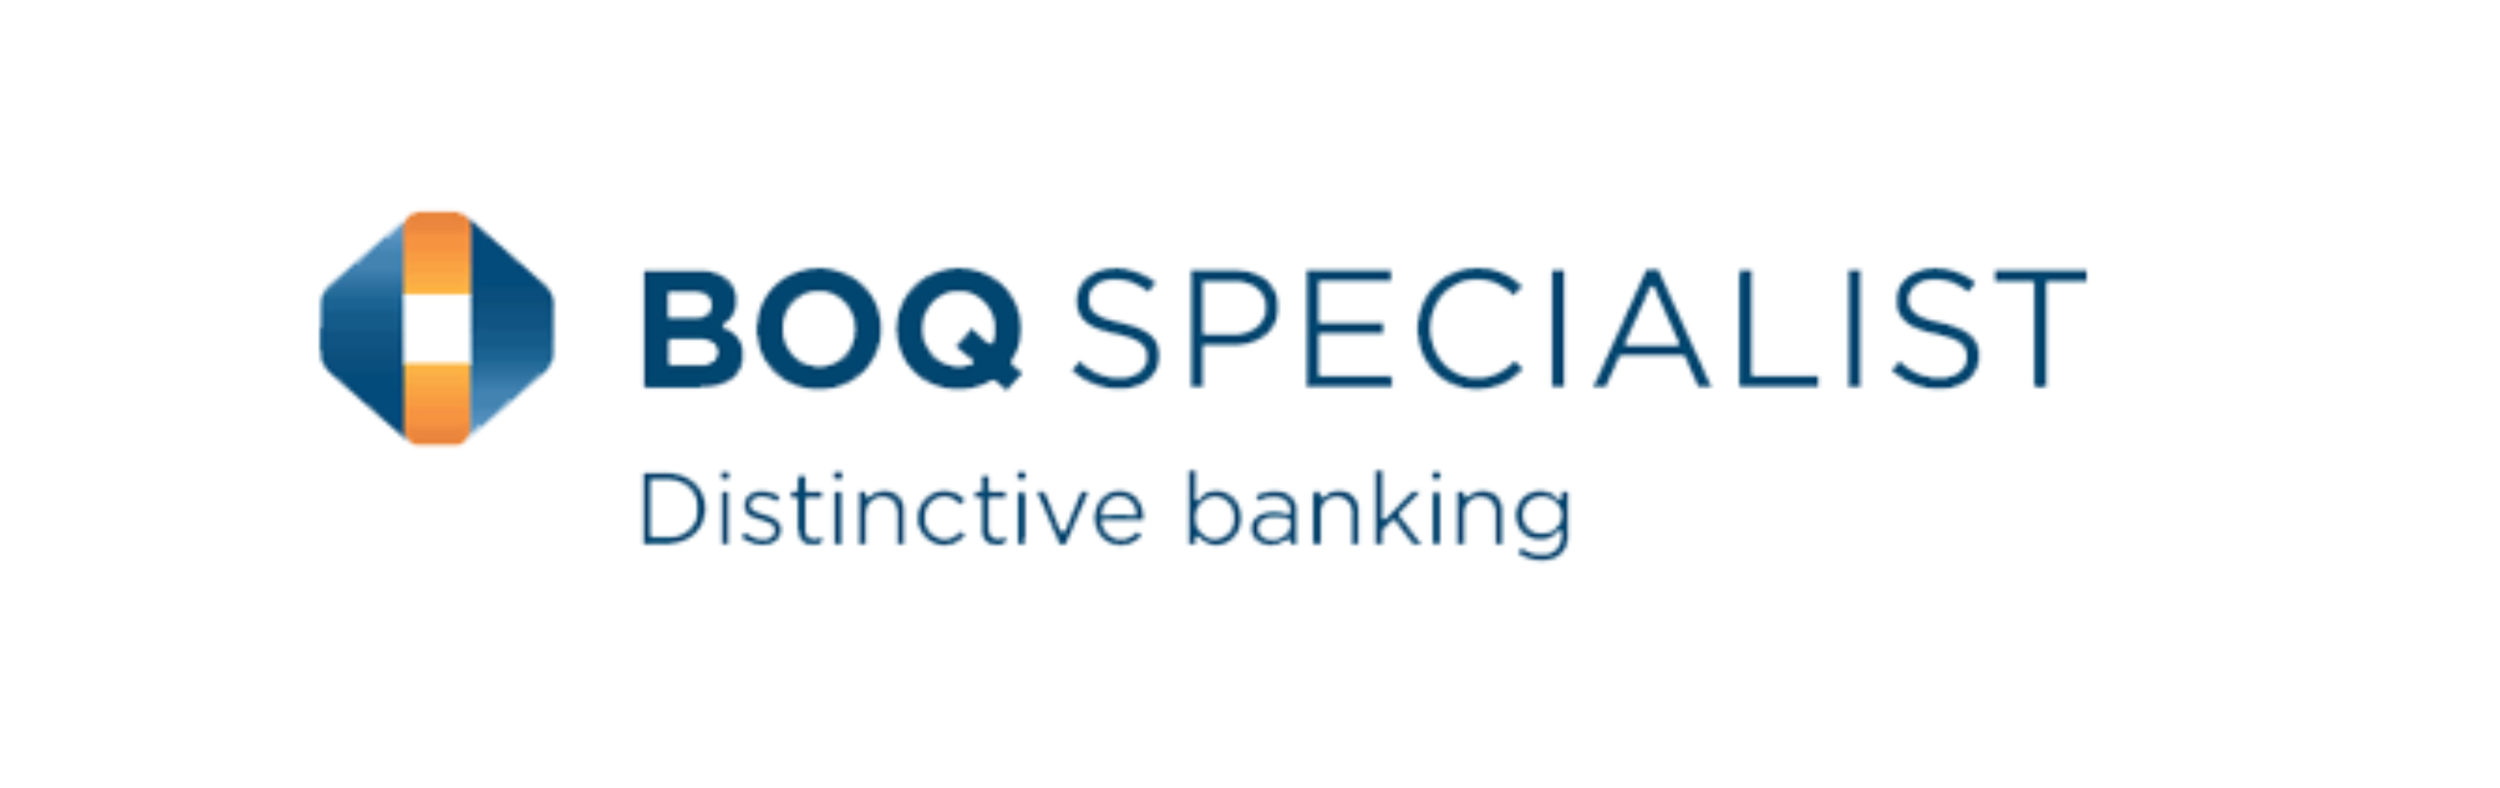 BOQ Specialist - Capstone Dental